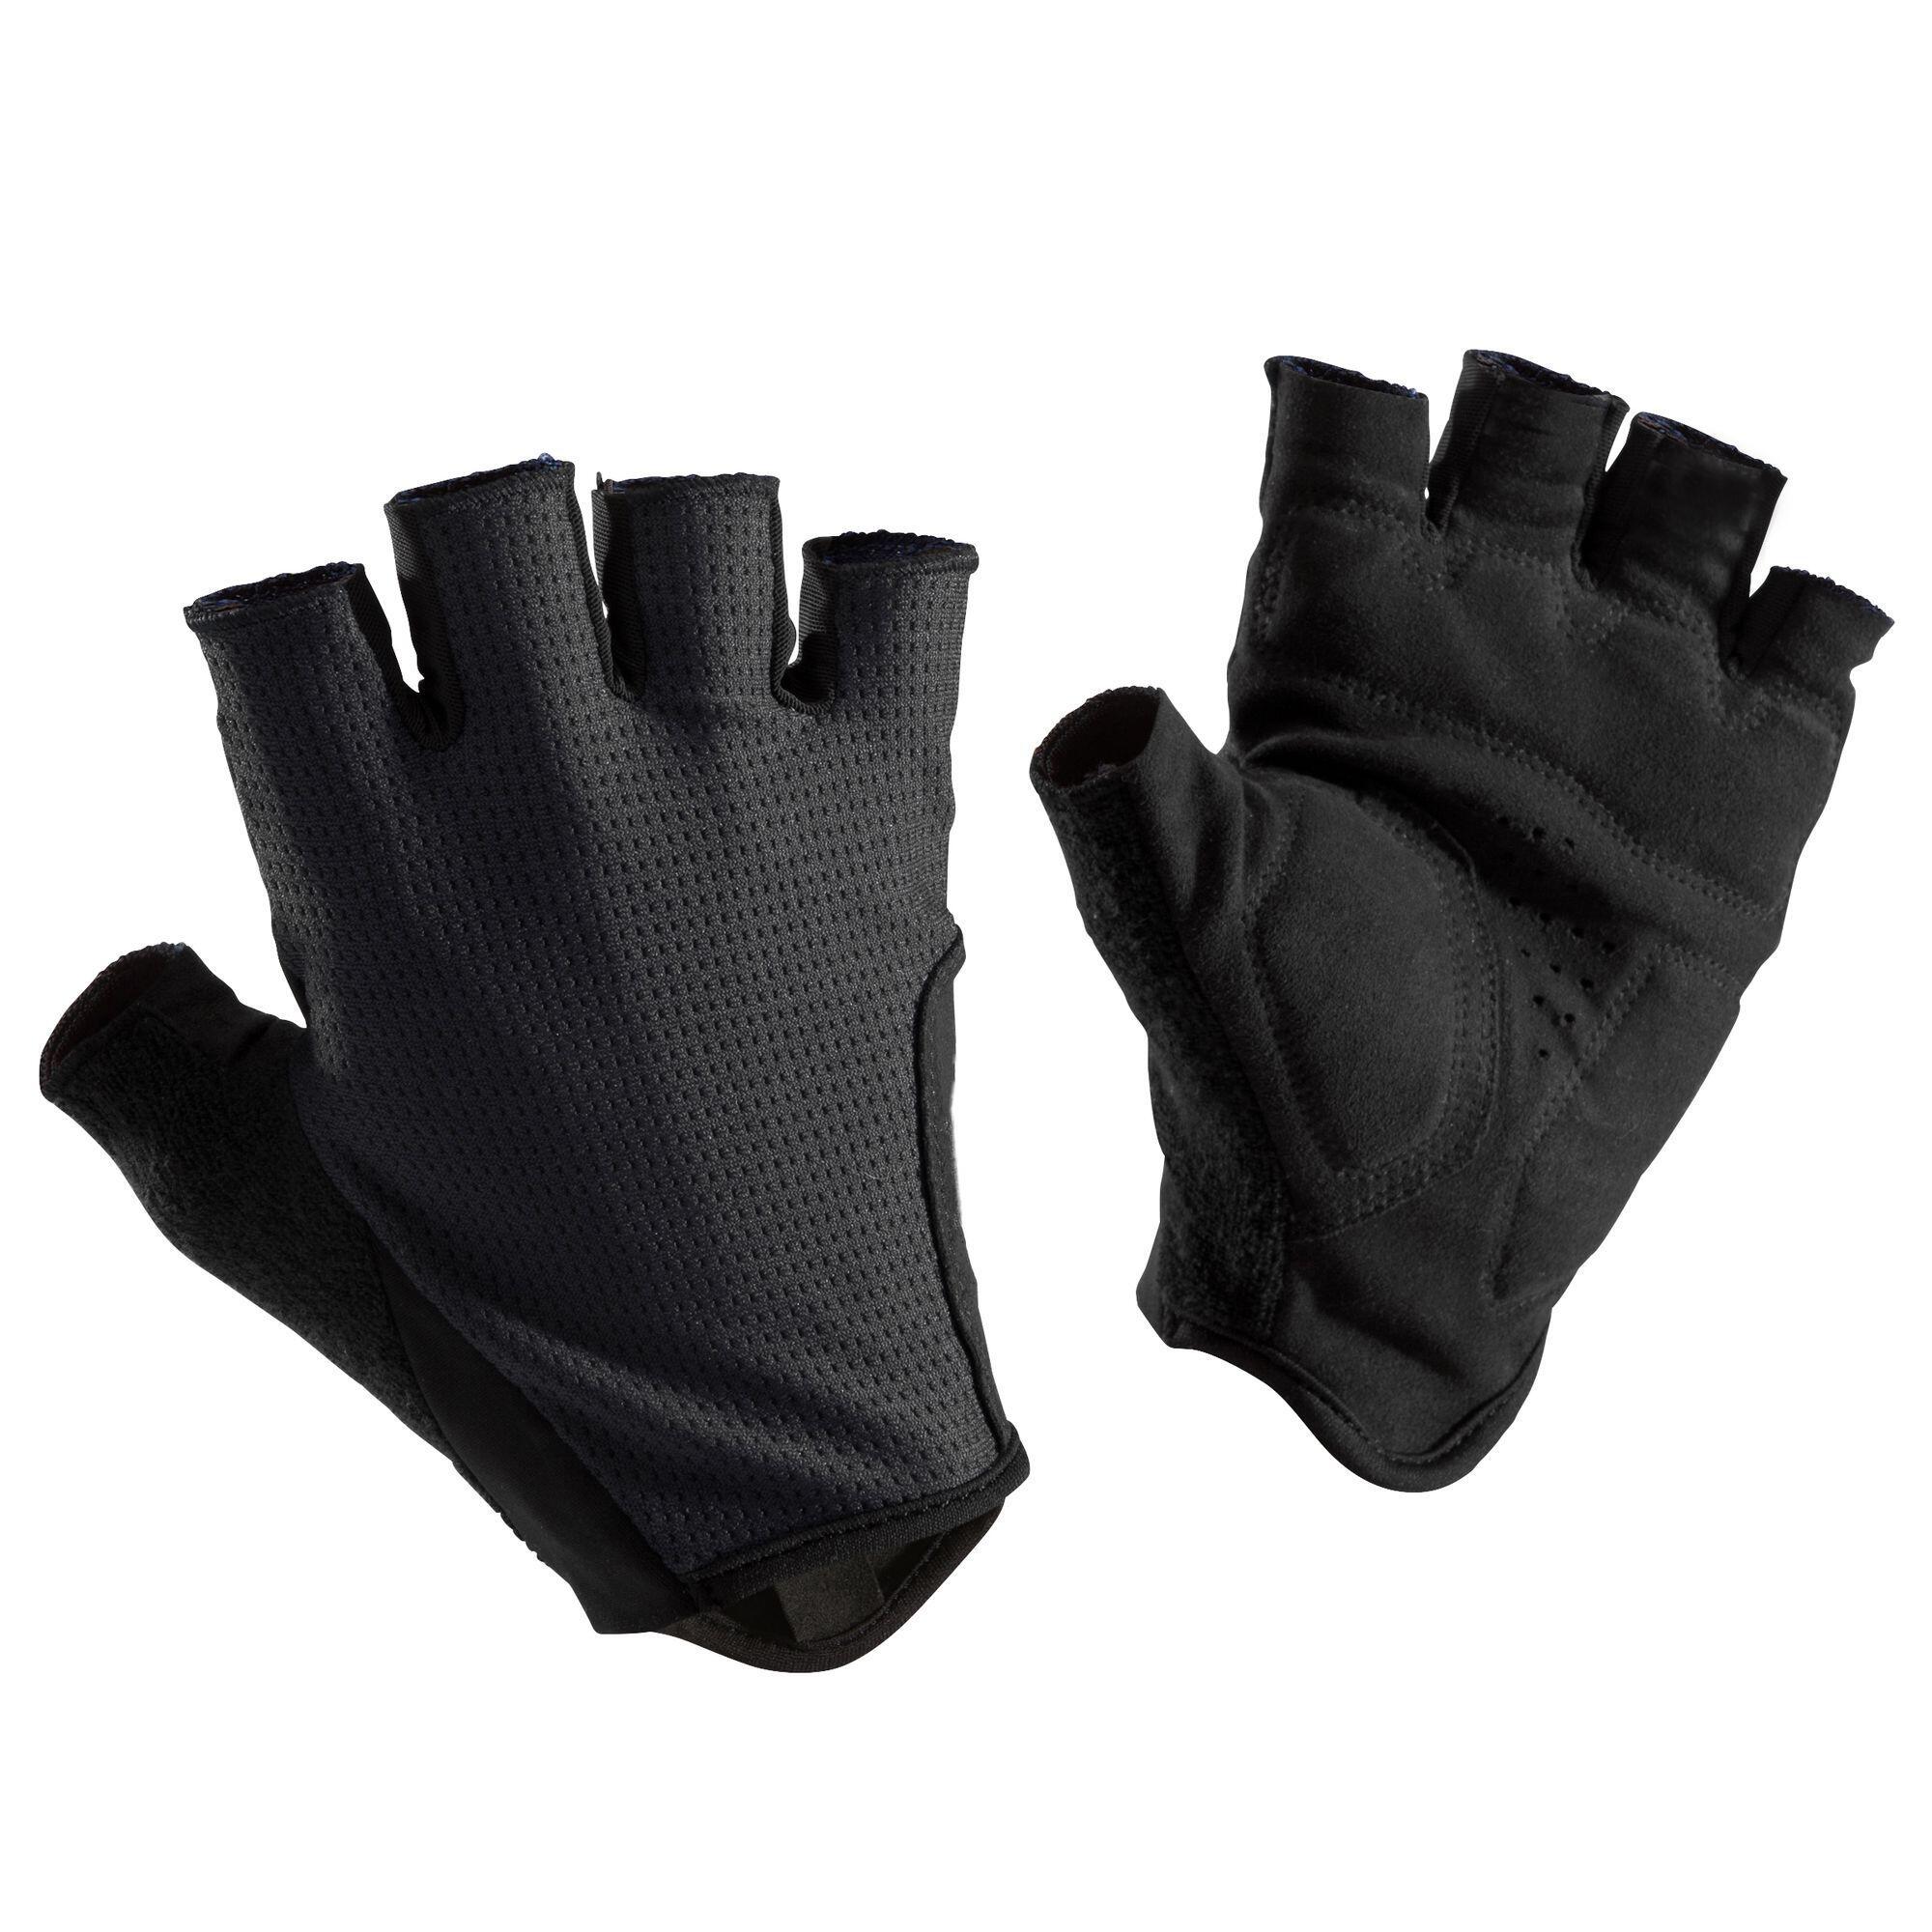 Fahrradhandschuhe Rennrad 500 neongelb | Accessoires > Handschuhe > Sonstige Handschuhe | Triban